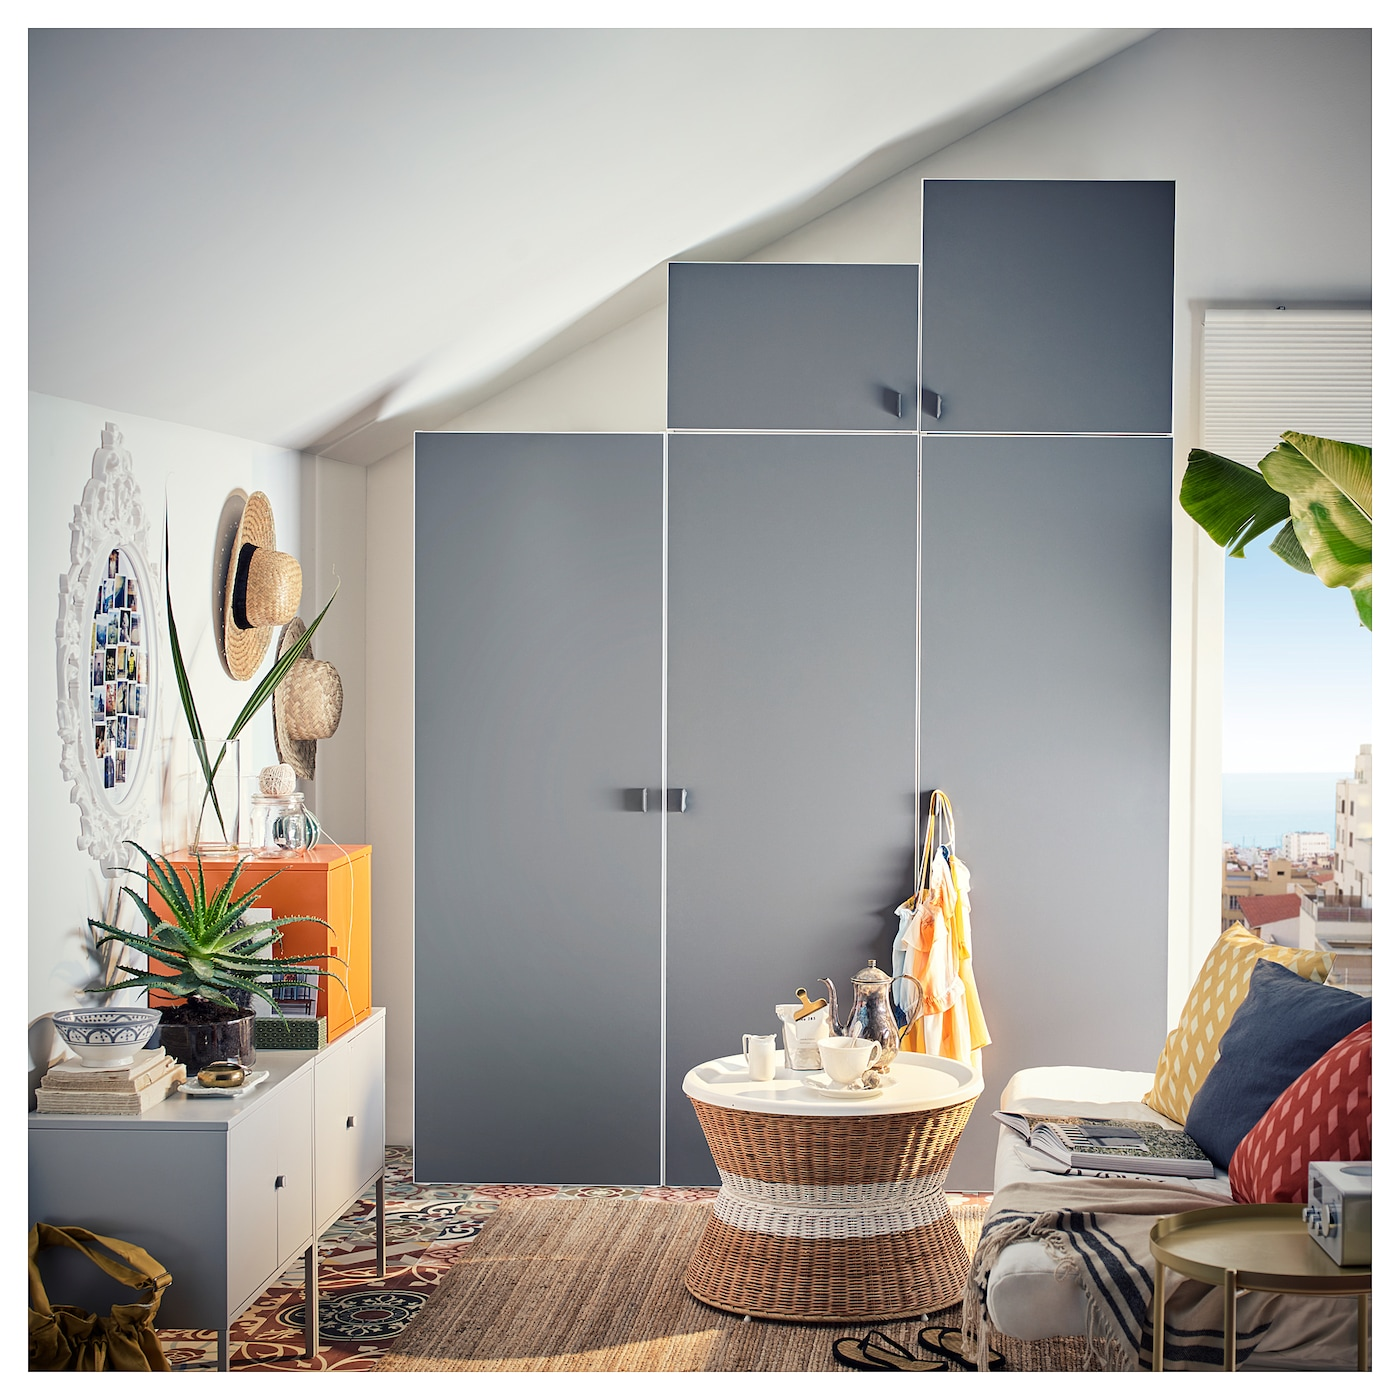 Ongebruikt PLATSA Kledingkast, wit, Skatval donkergrijs. Lees meer - IKEA HZ-41